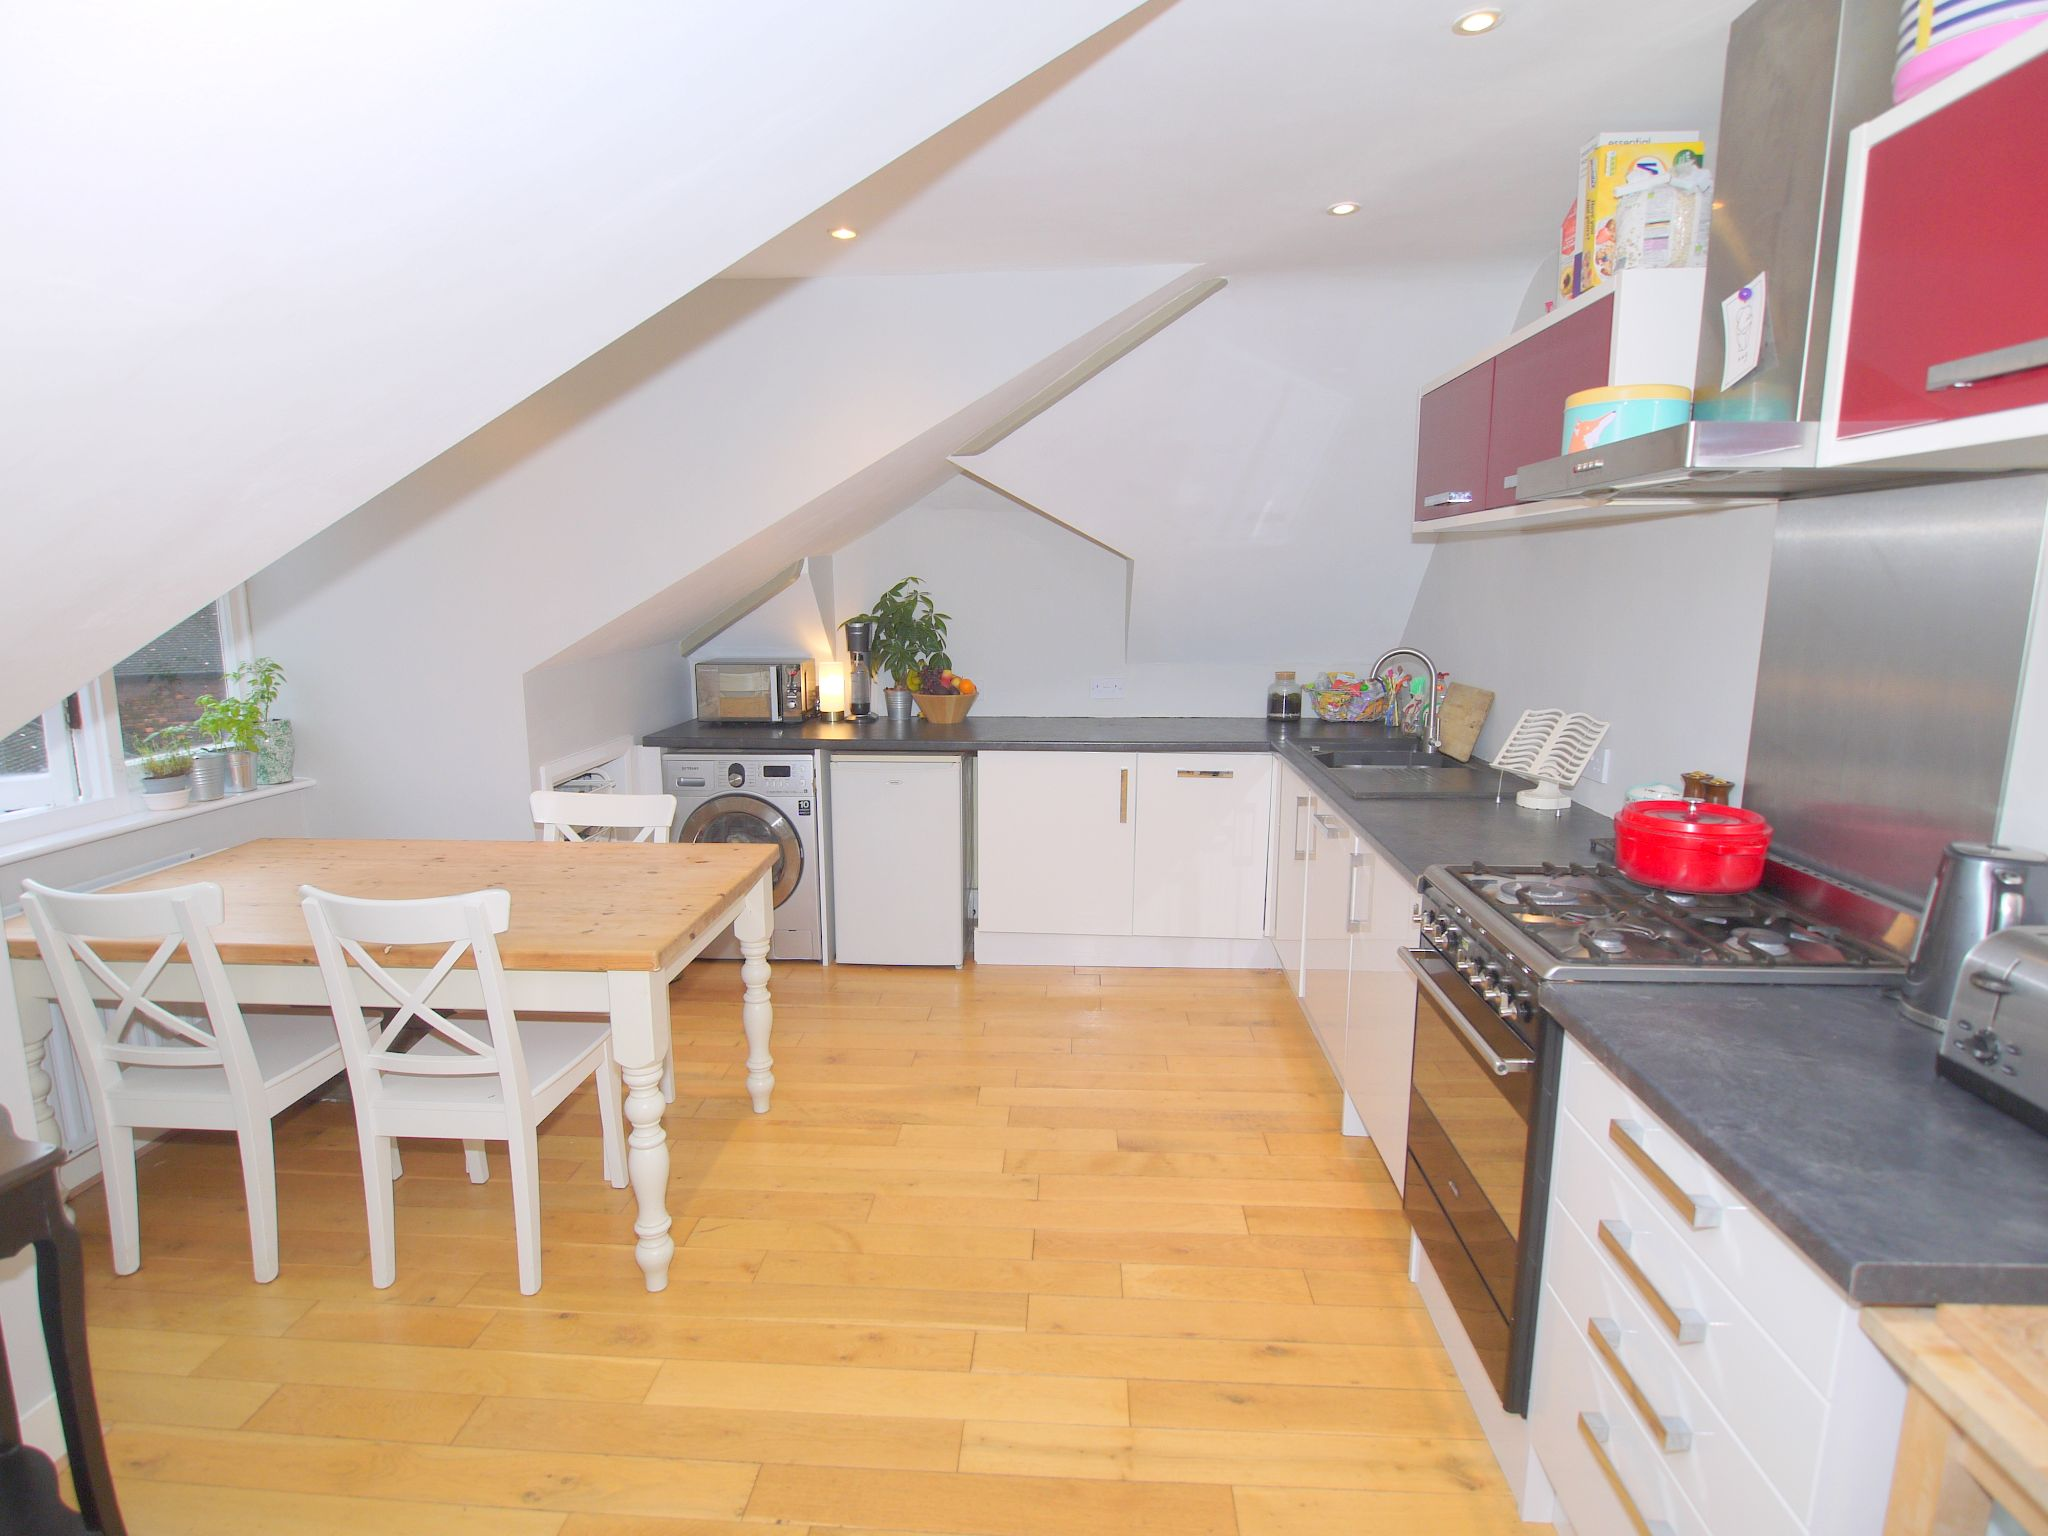 2 bedroom flat Sold in Sevenoaks - Photograph 2